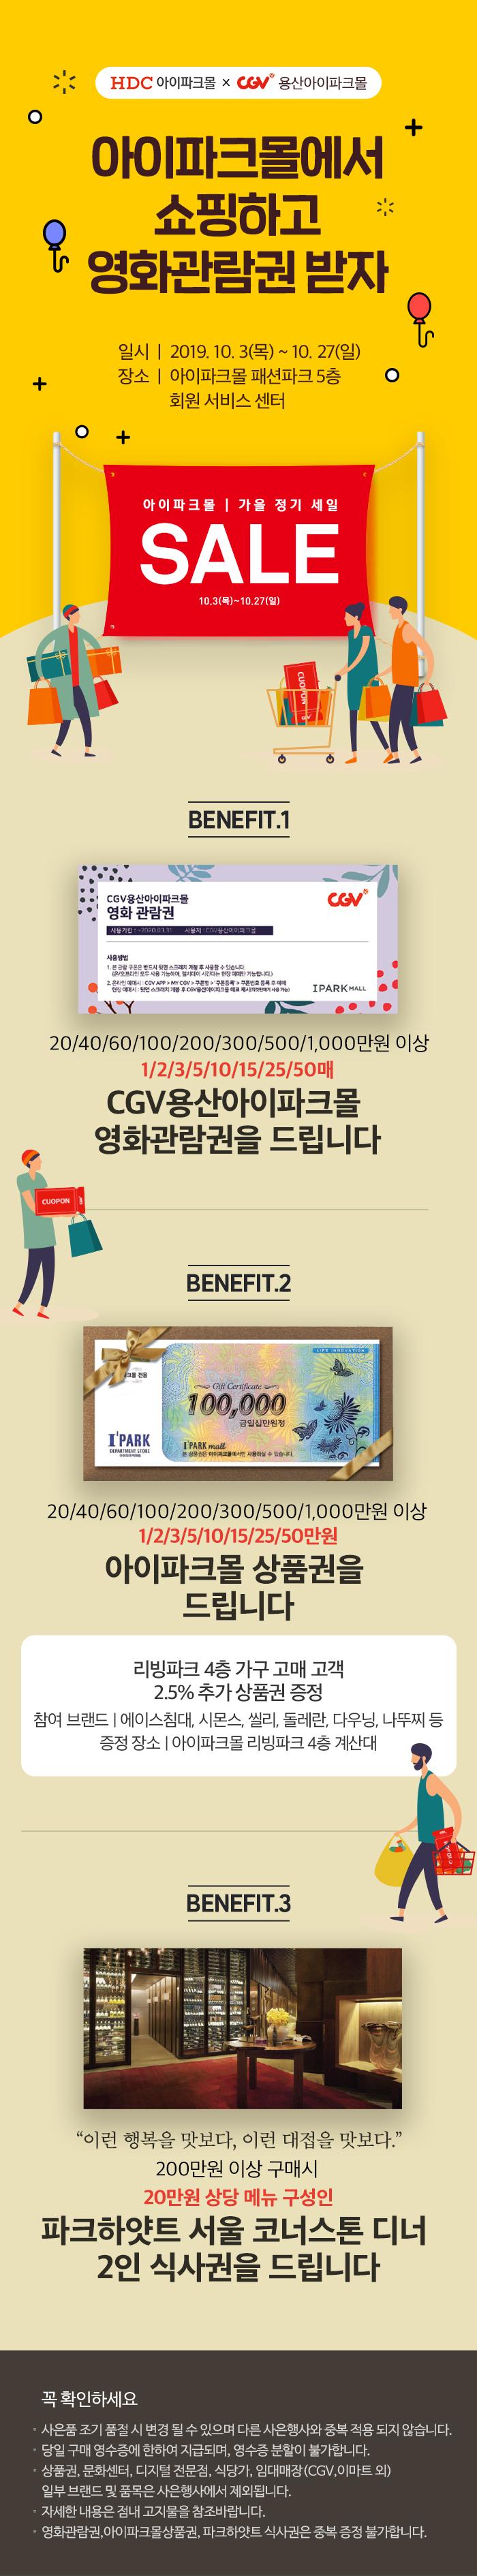 CGV극장별 [CGV용산아이파크몰] 아이파크몰에서 쇼핑하고 영화관람권 받자